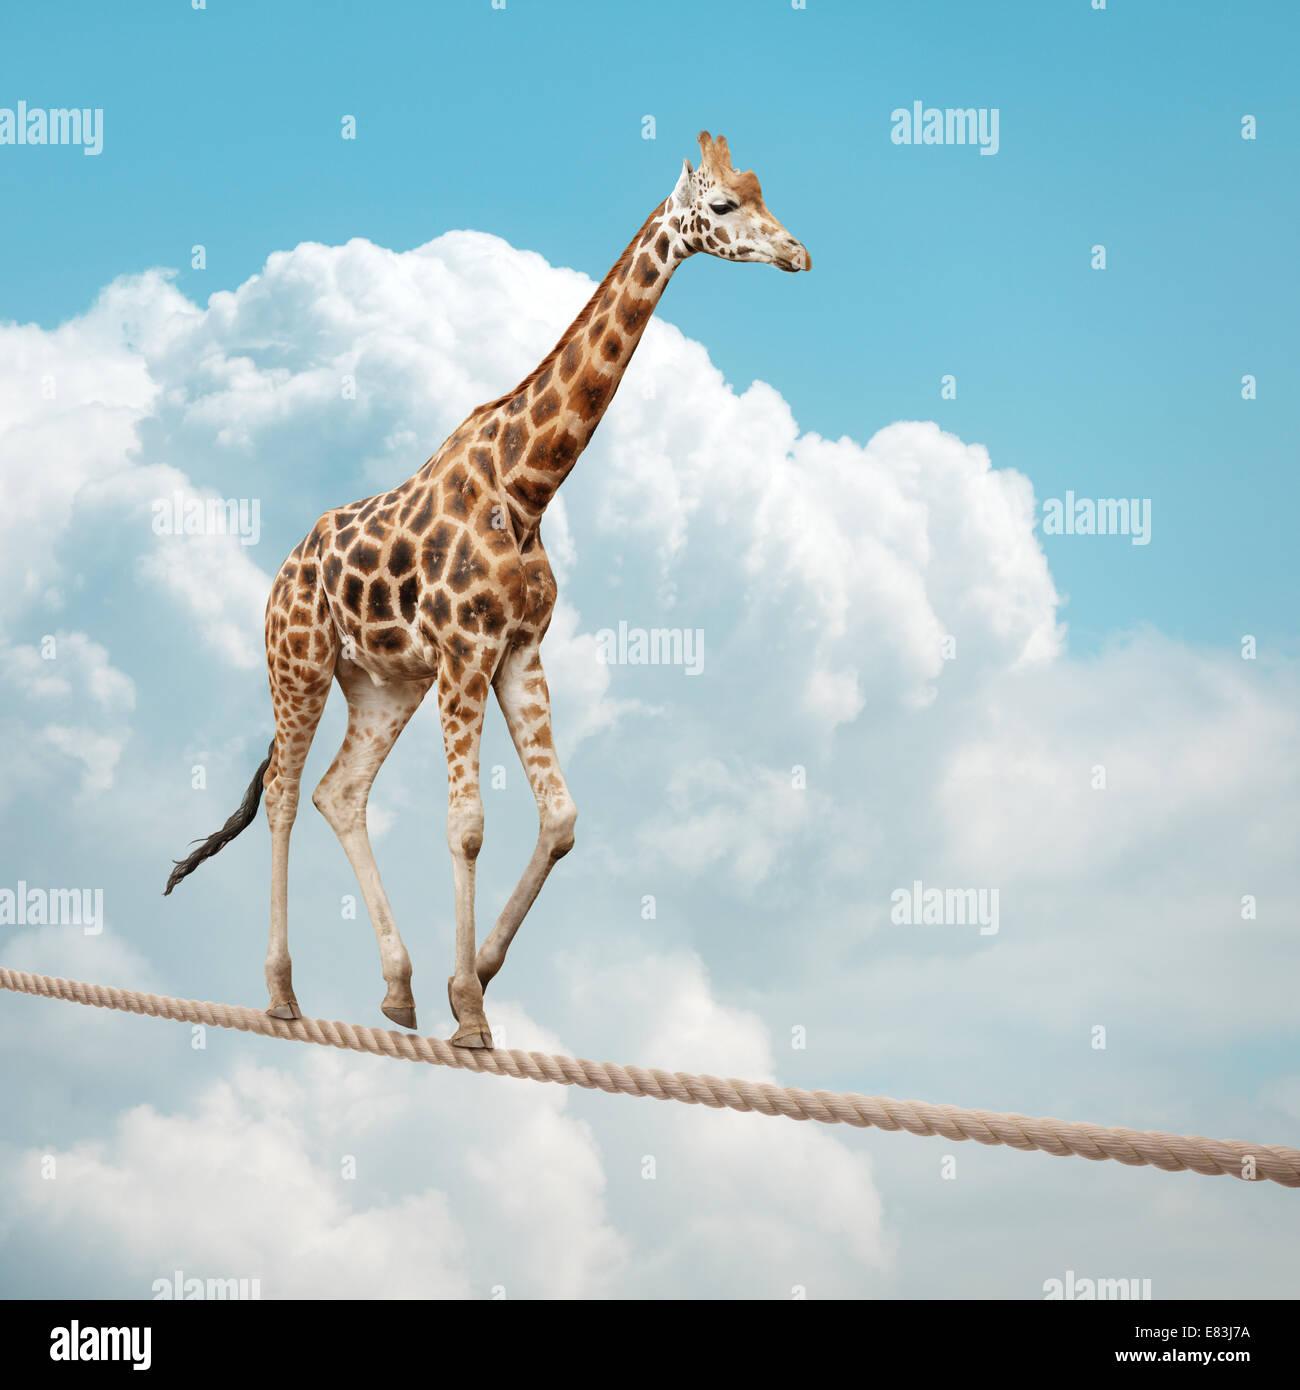 Giraffe, balancieren auf einem Drahtseil Stockbild